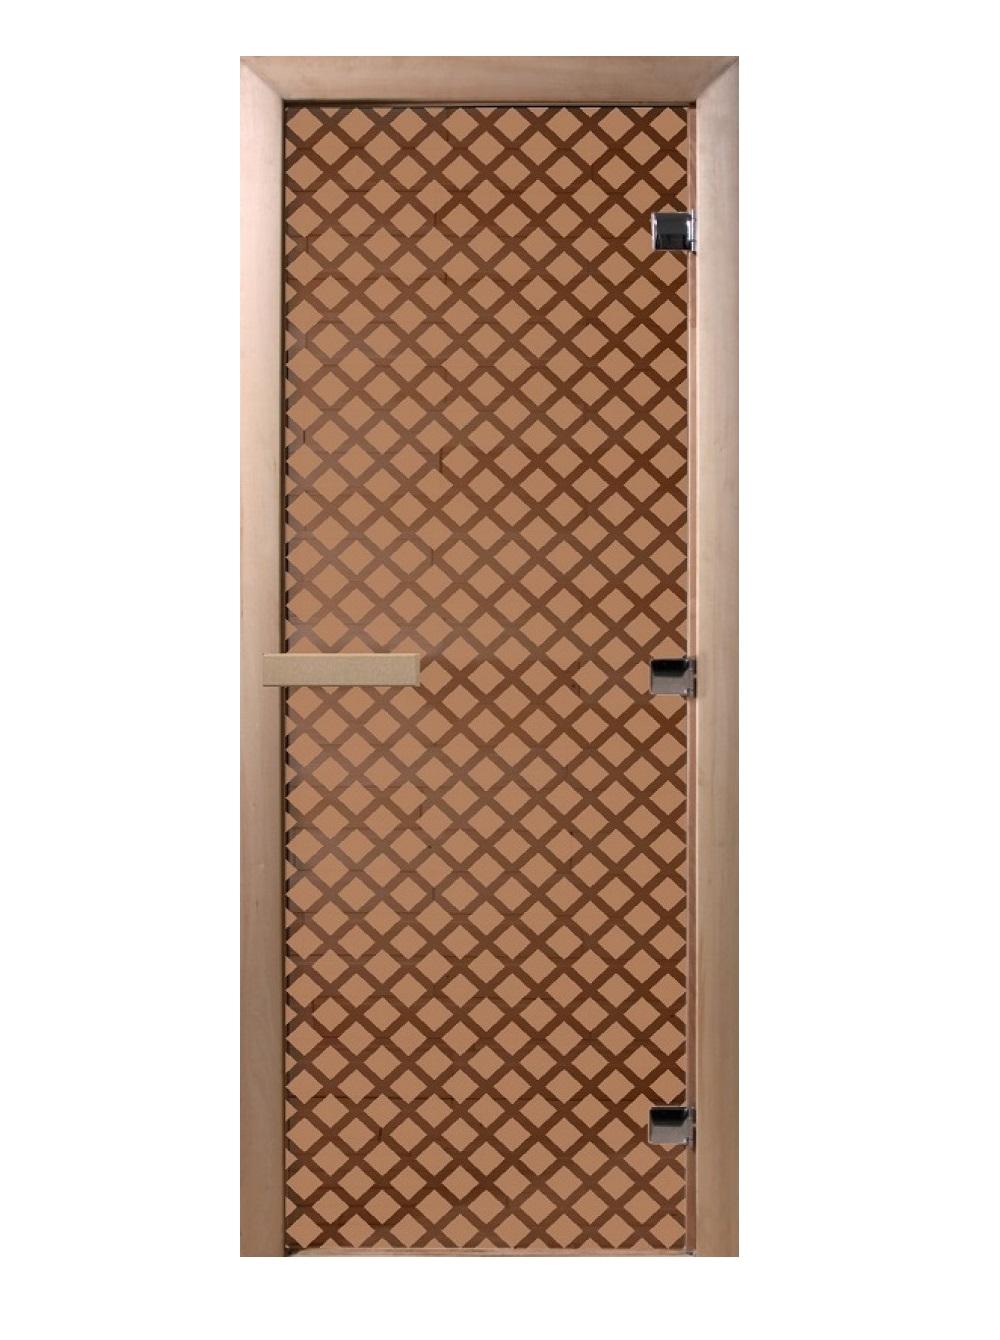 Дверь стеклянная для саун «Мираж» бронза 700х1900мм